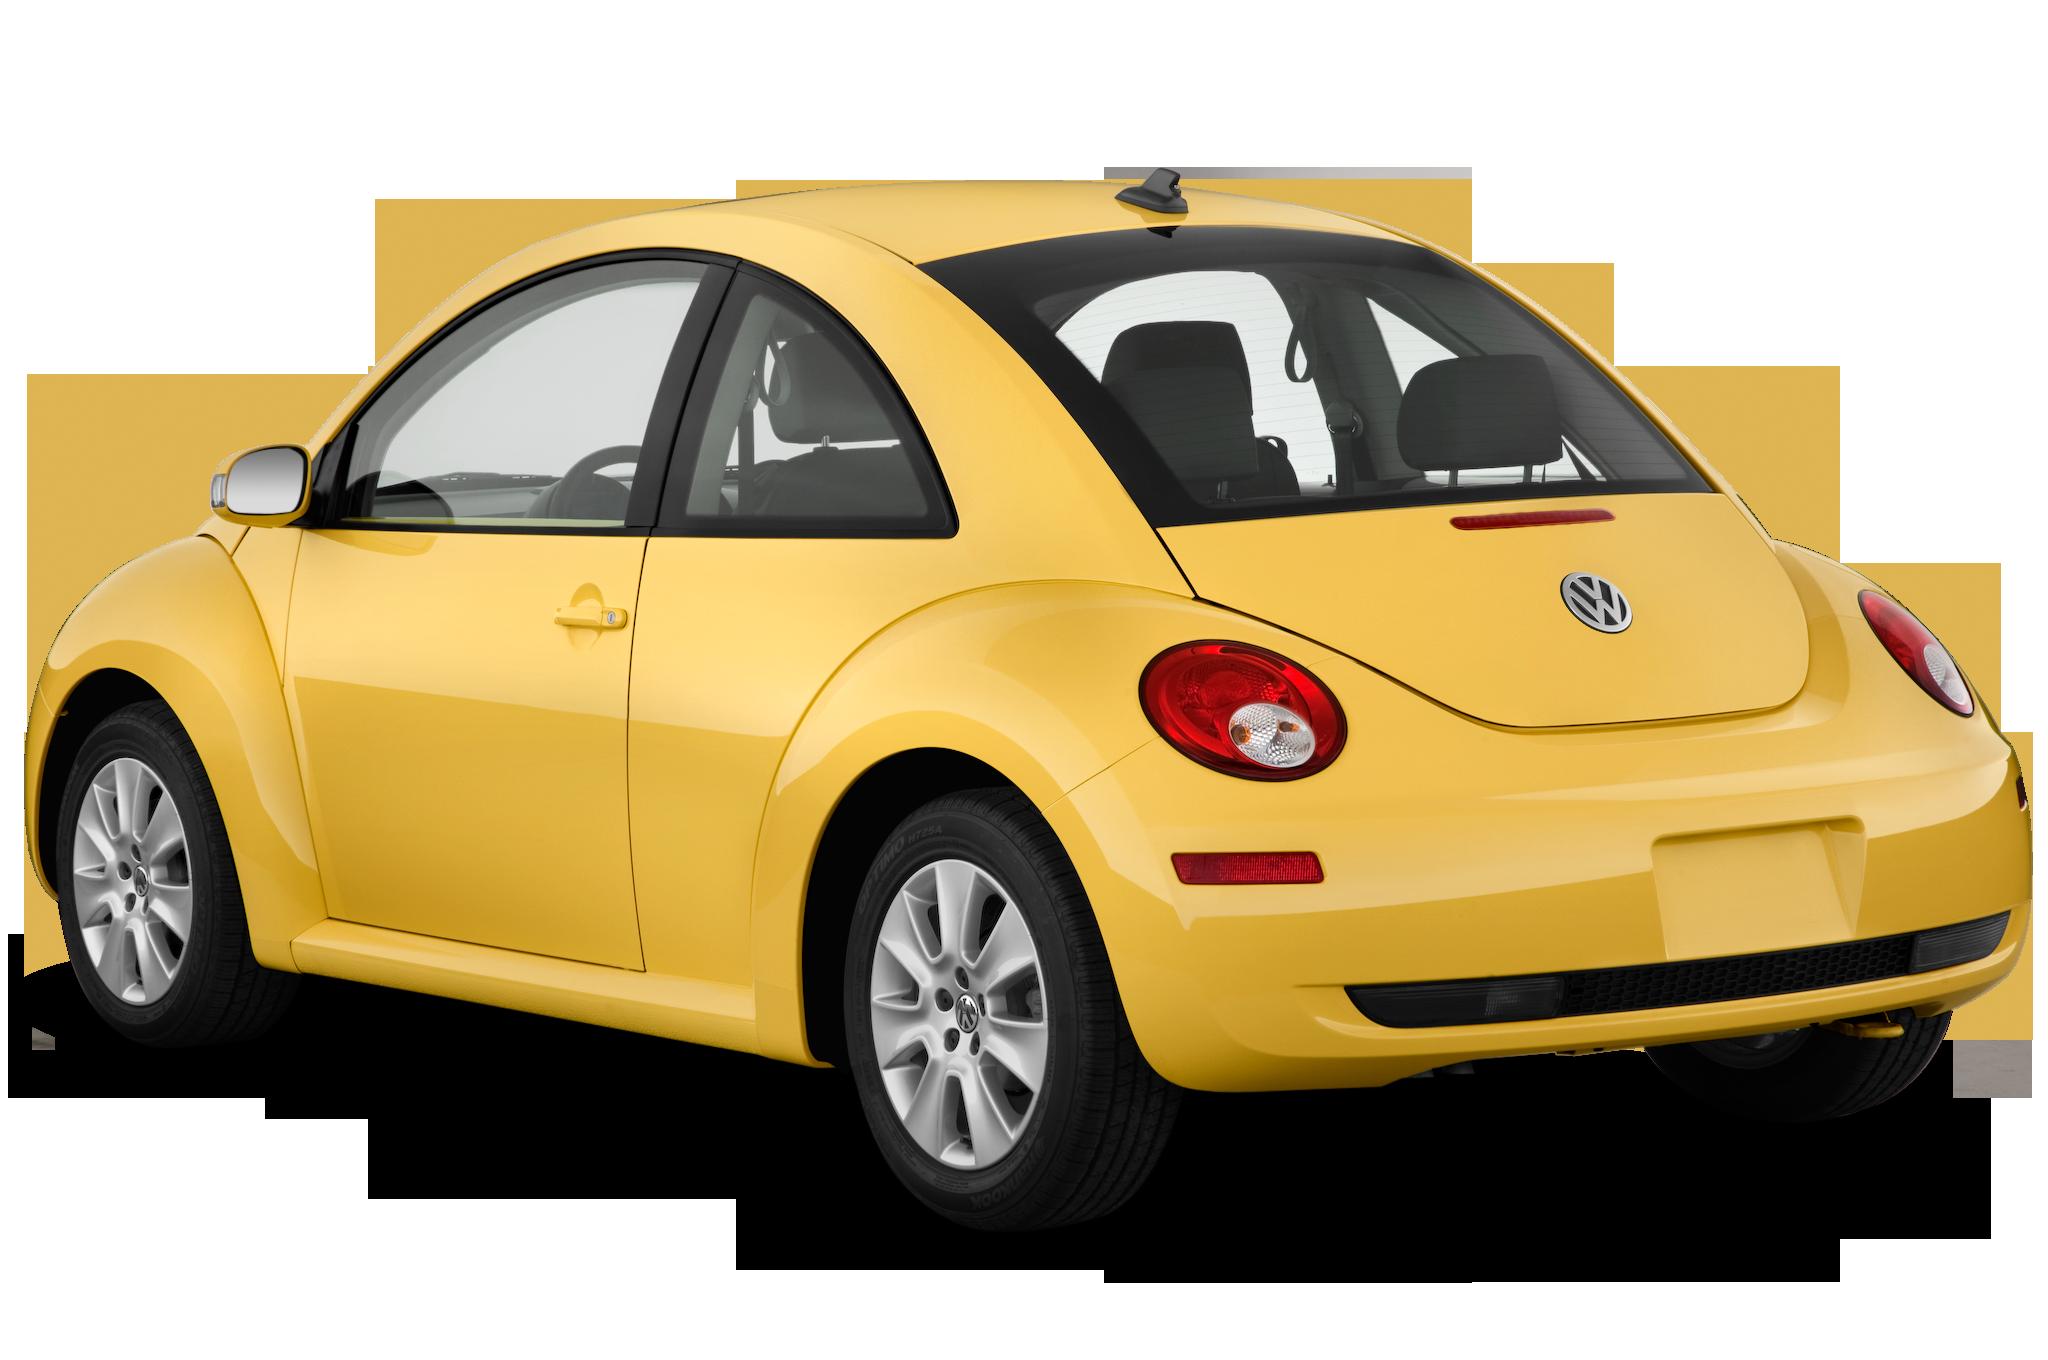 first look: 2010 volkswagen new beetle final edition - 2009 la auto